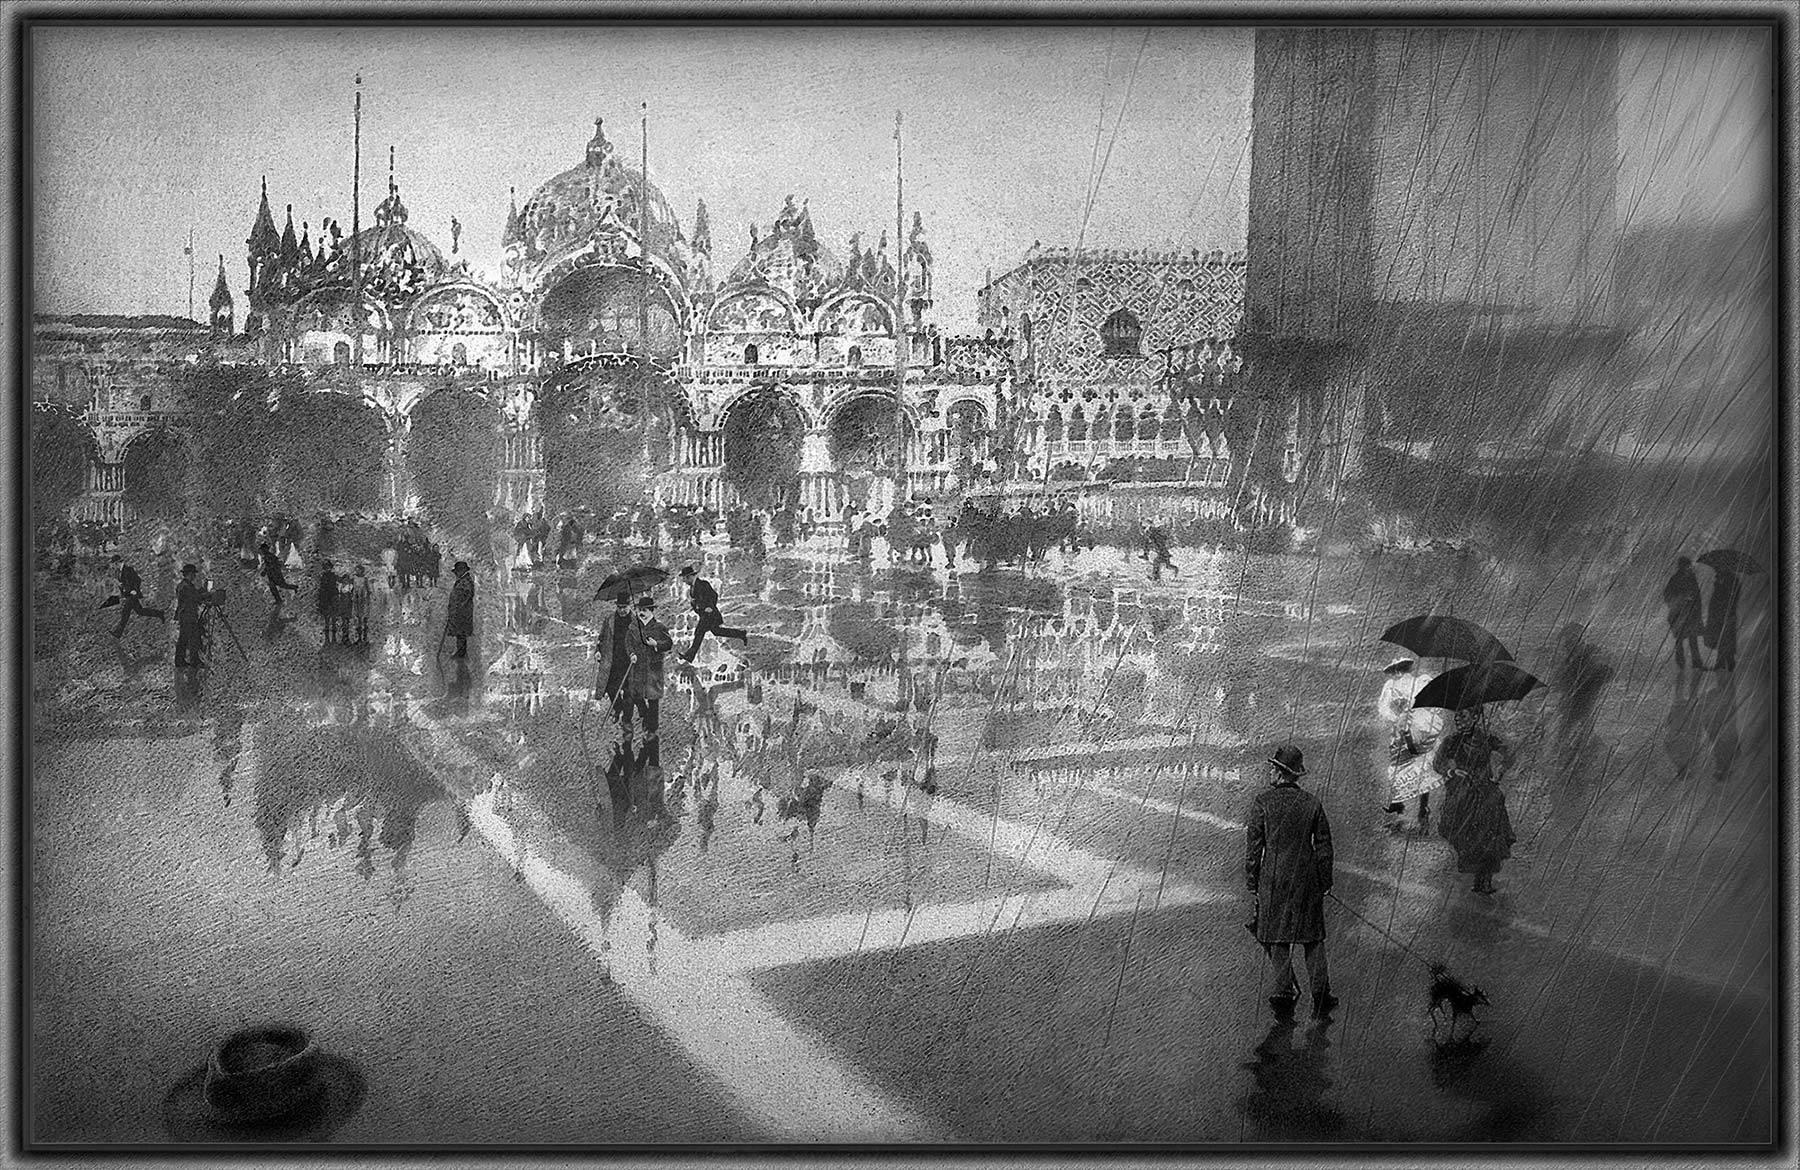 Peter Milton - Giardini Reali, Print For Sale at 1stdibs